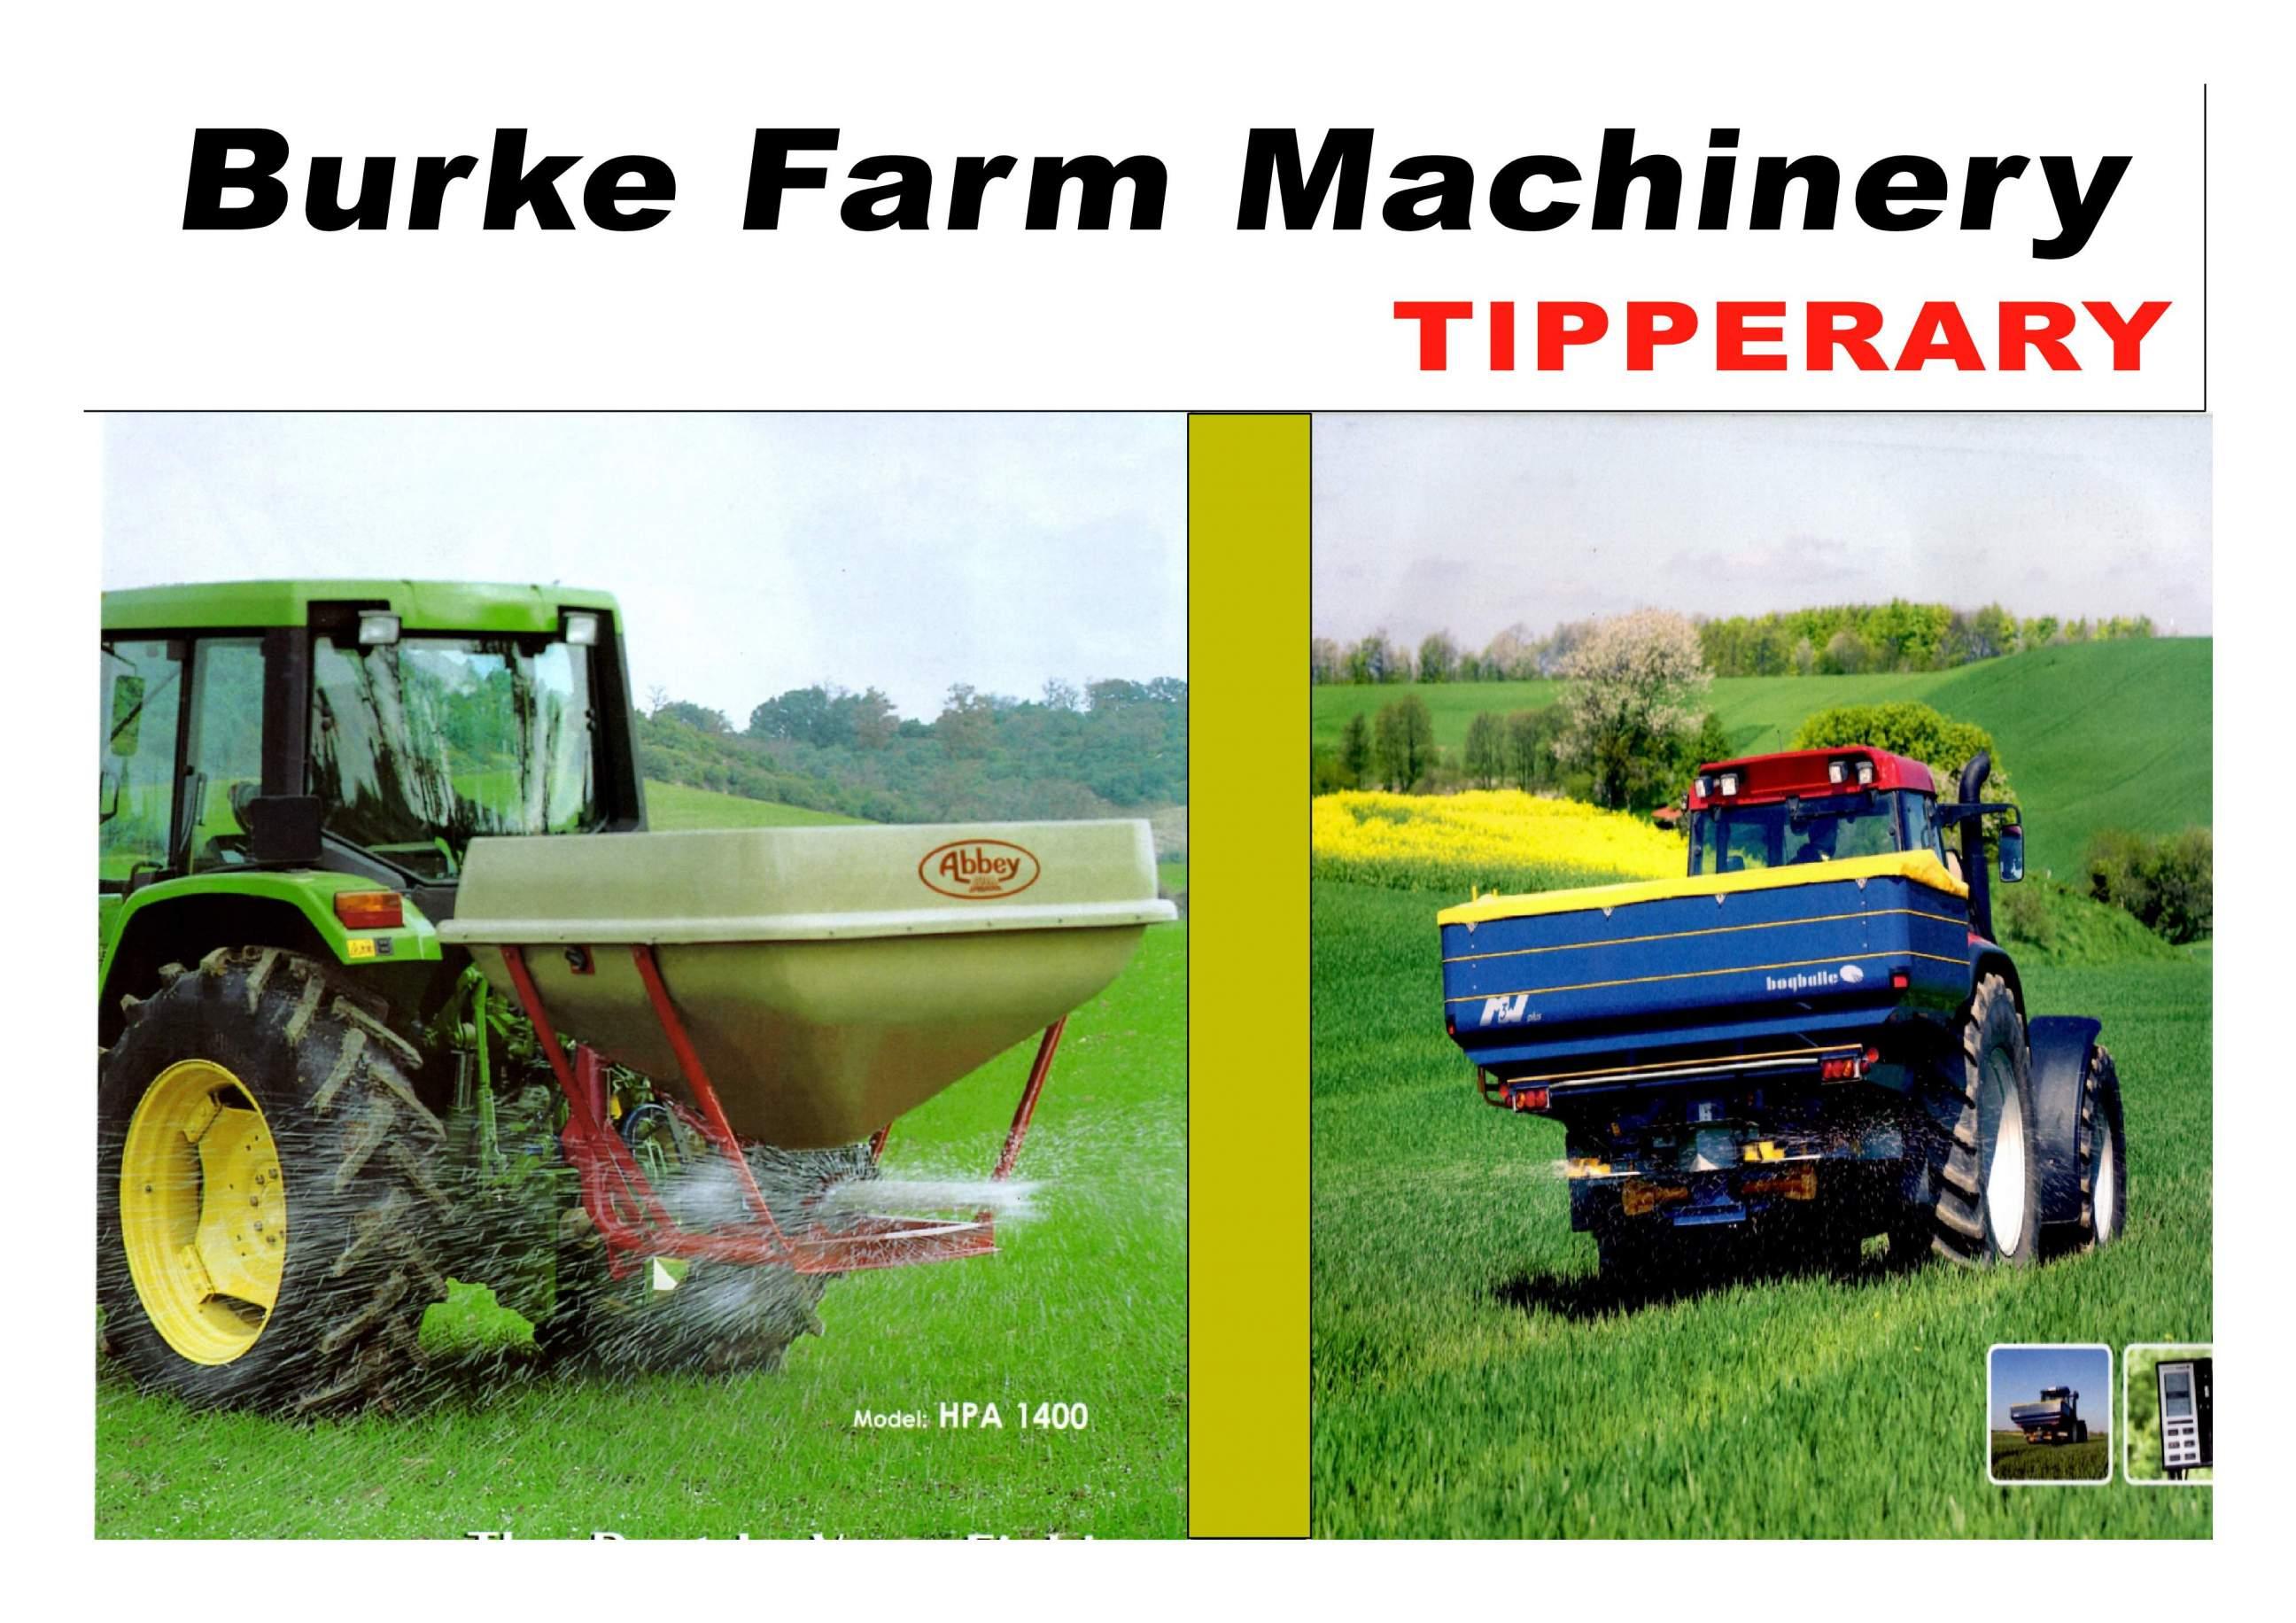 Burke Farm Machinery